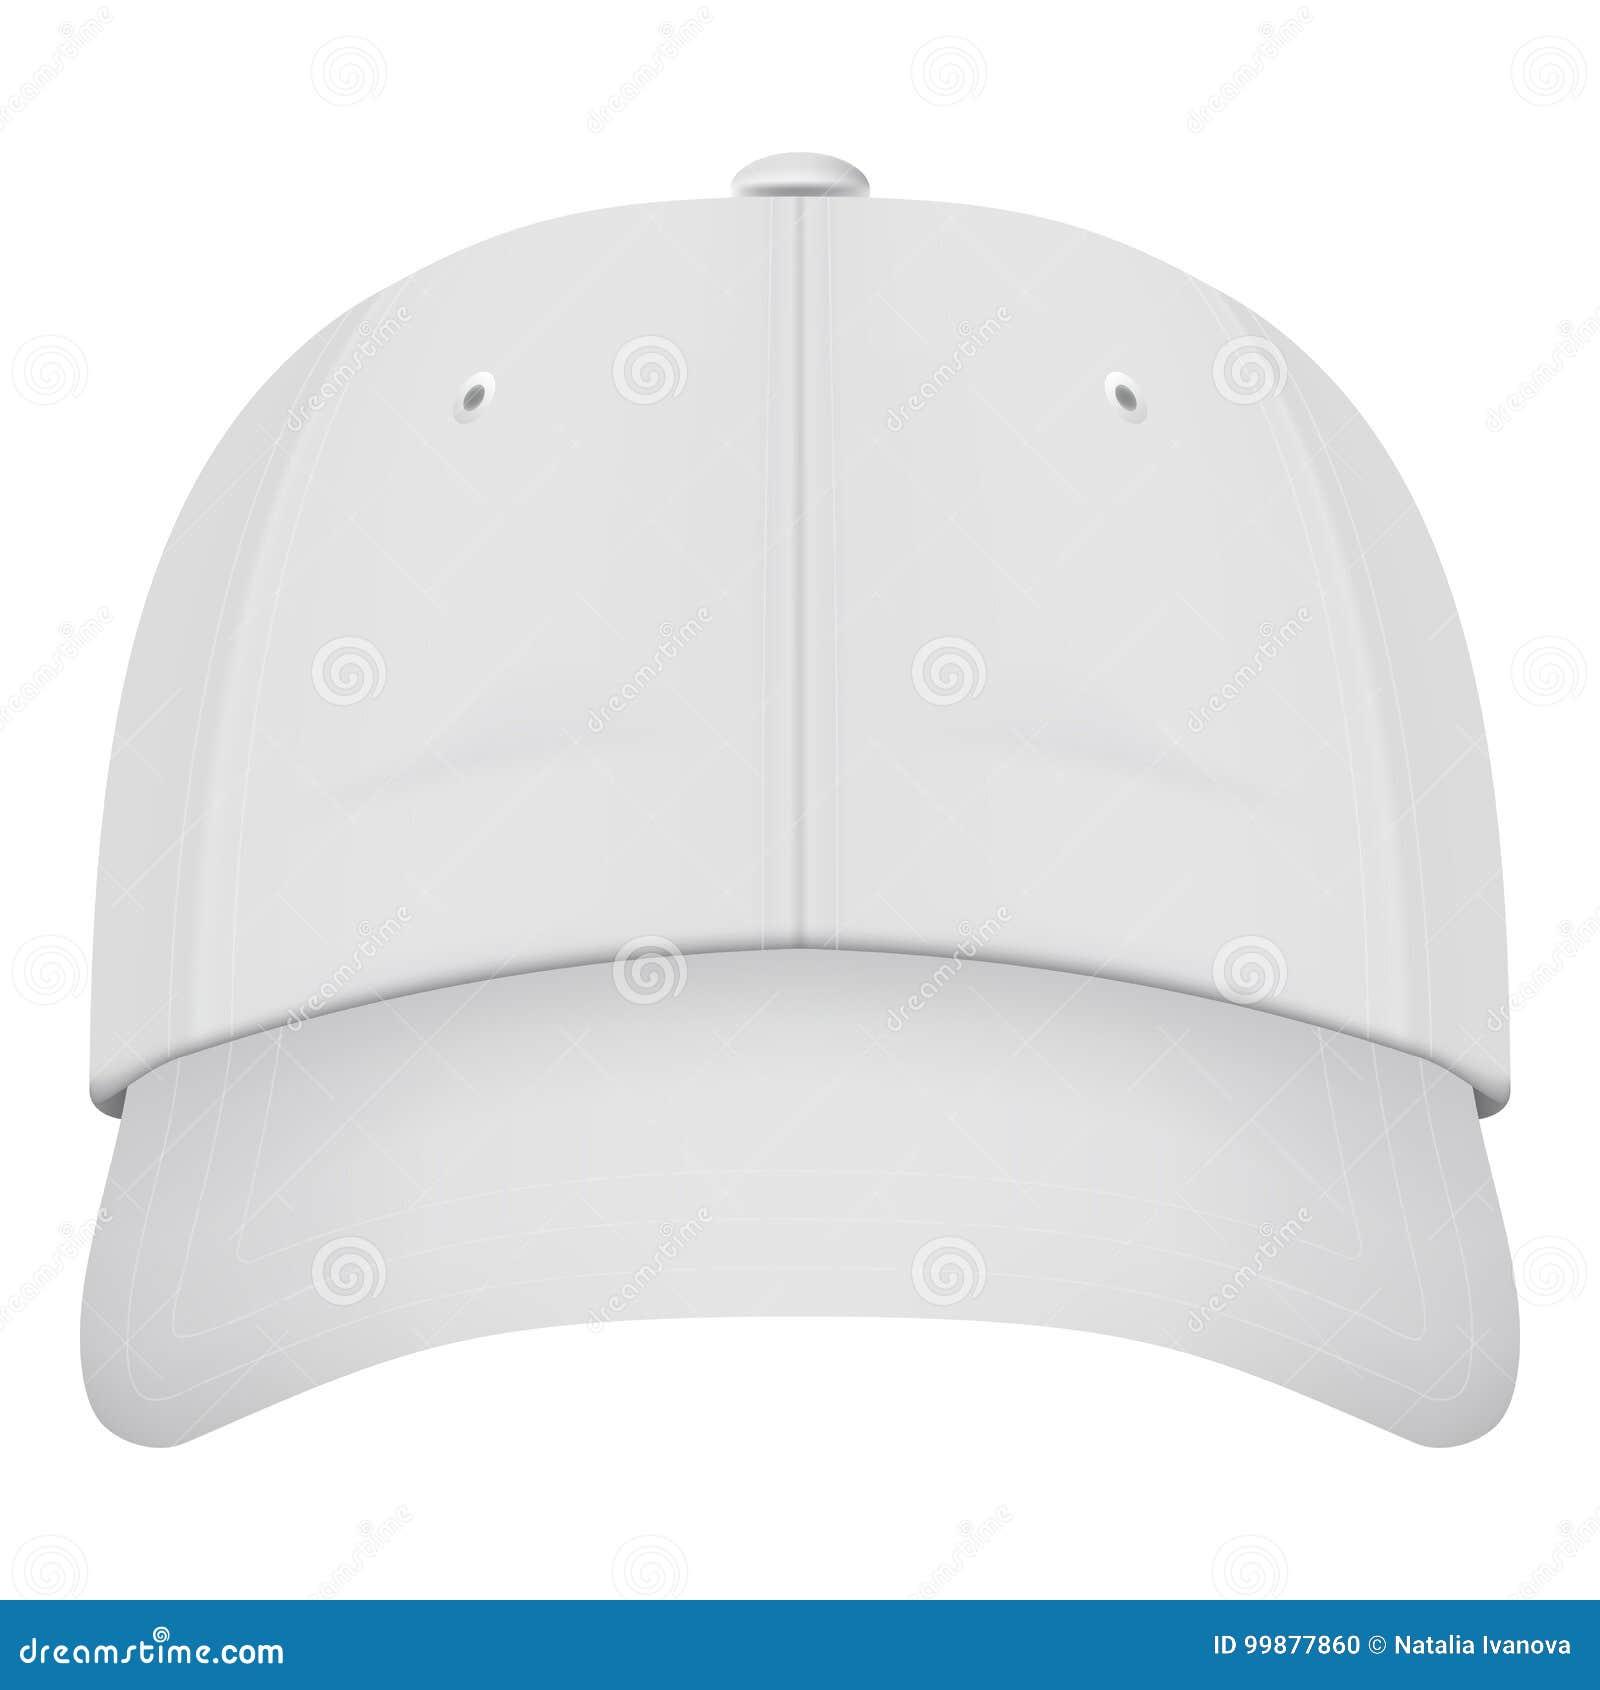 Front View White Baseball Cap realista aislado en un fondo blanco  Ilustración del vector 1952233a806